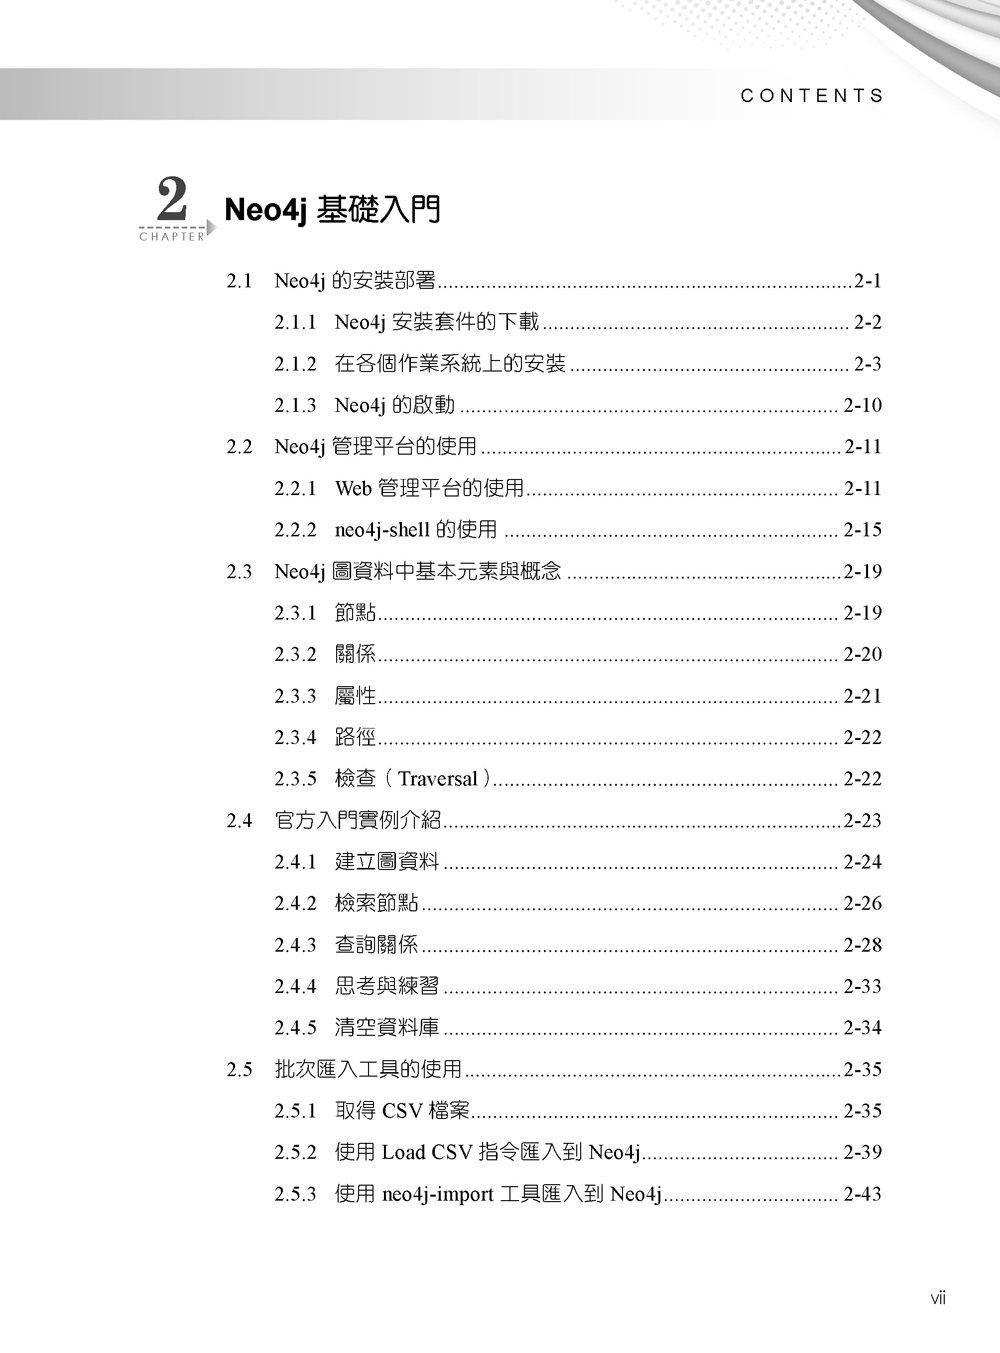 Neo4j 大事典 : 圖形資料庫 & 大數據時代-preview-3